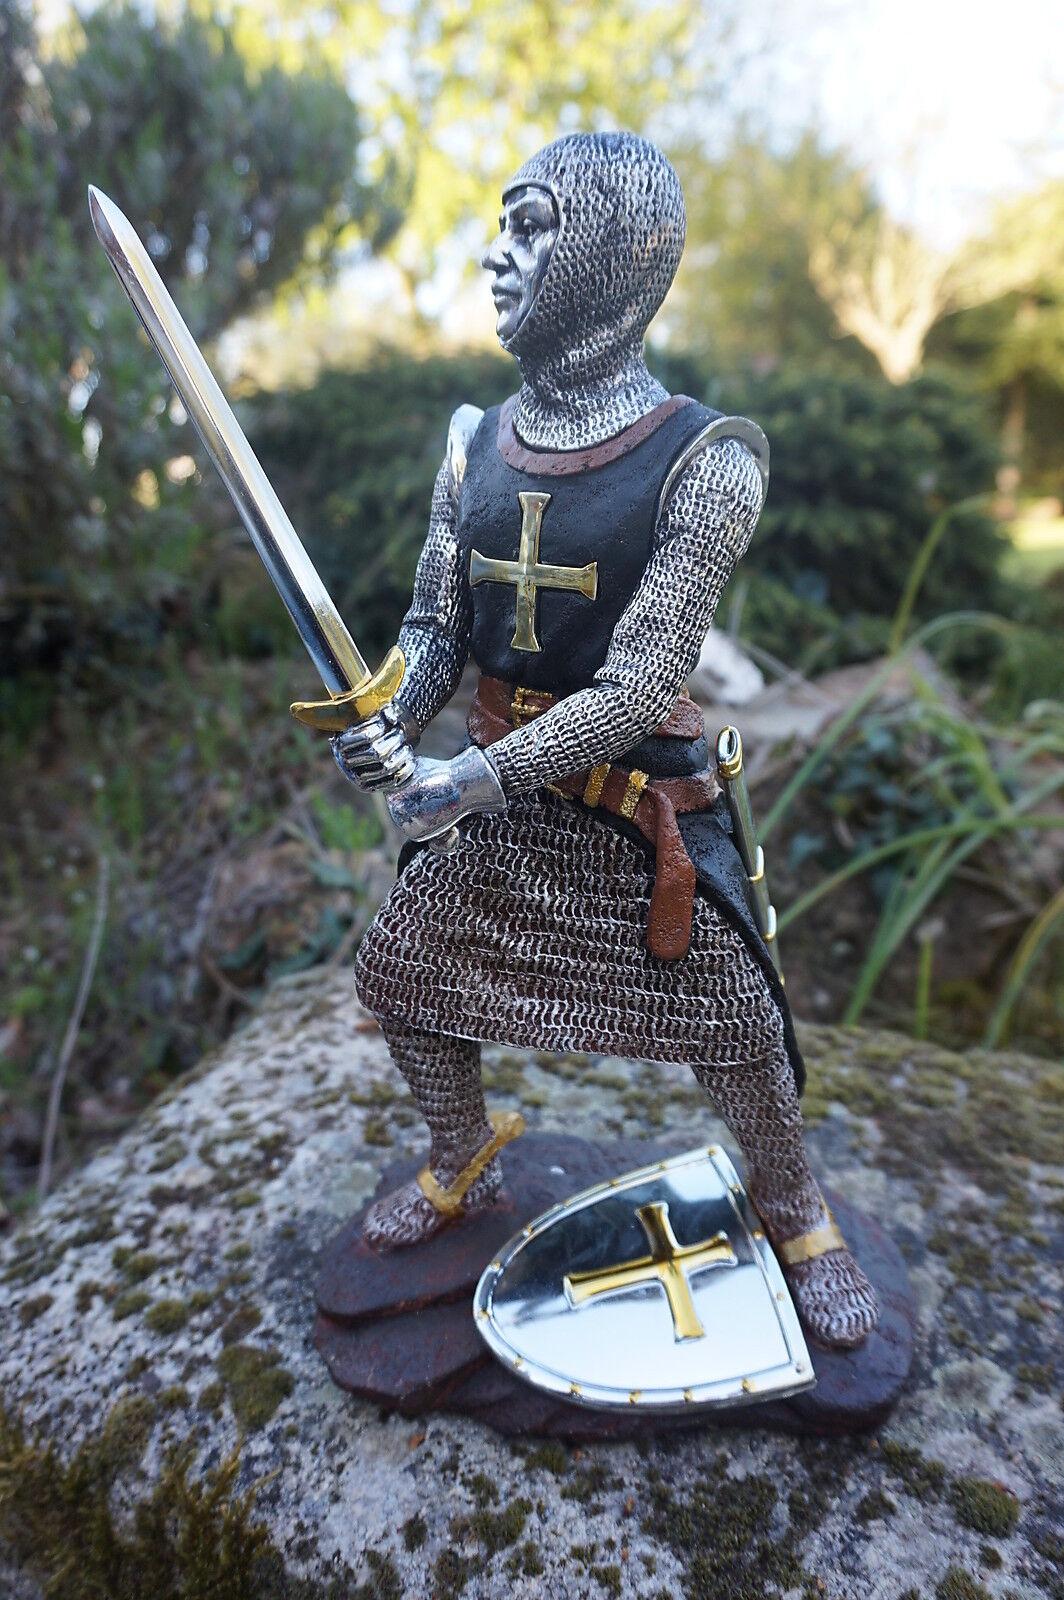 15110  B  FIGURINE  STATUETTE CHEVALIER  ARMURE CROISE TEMPLIER  MEDIEVAL